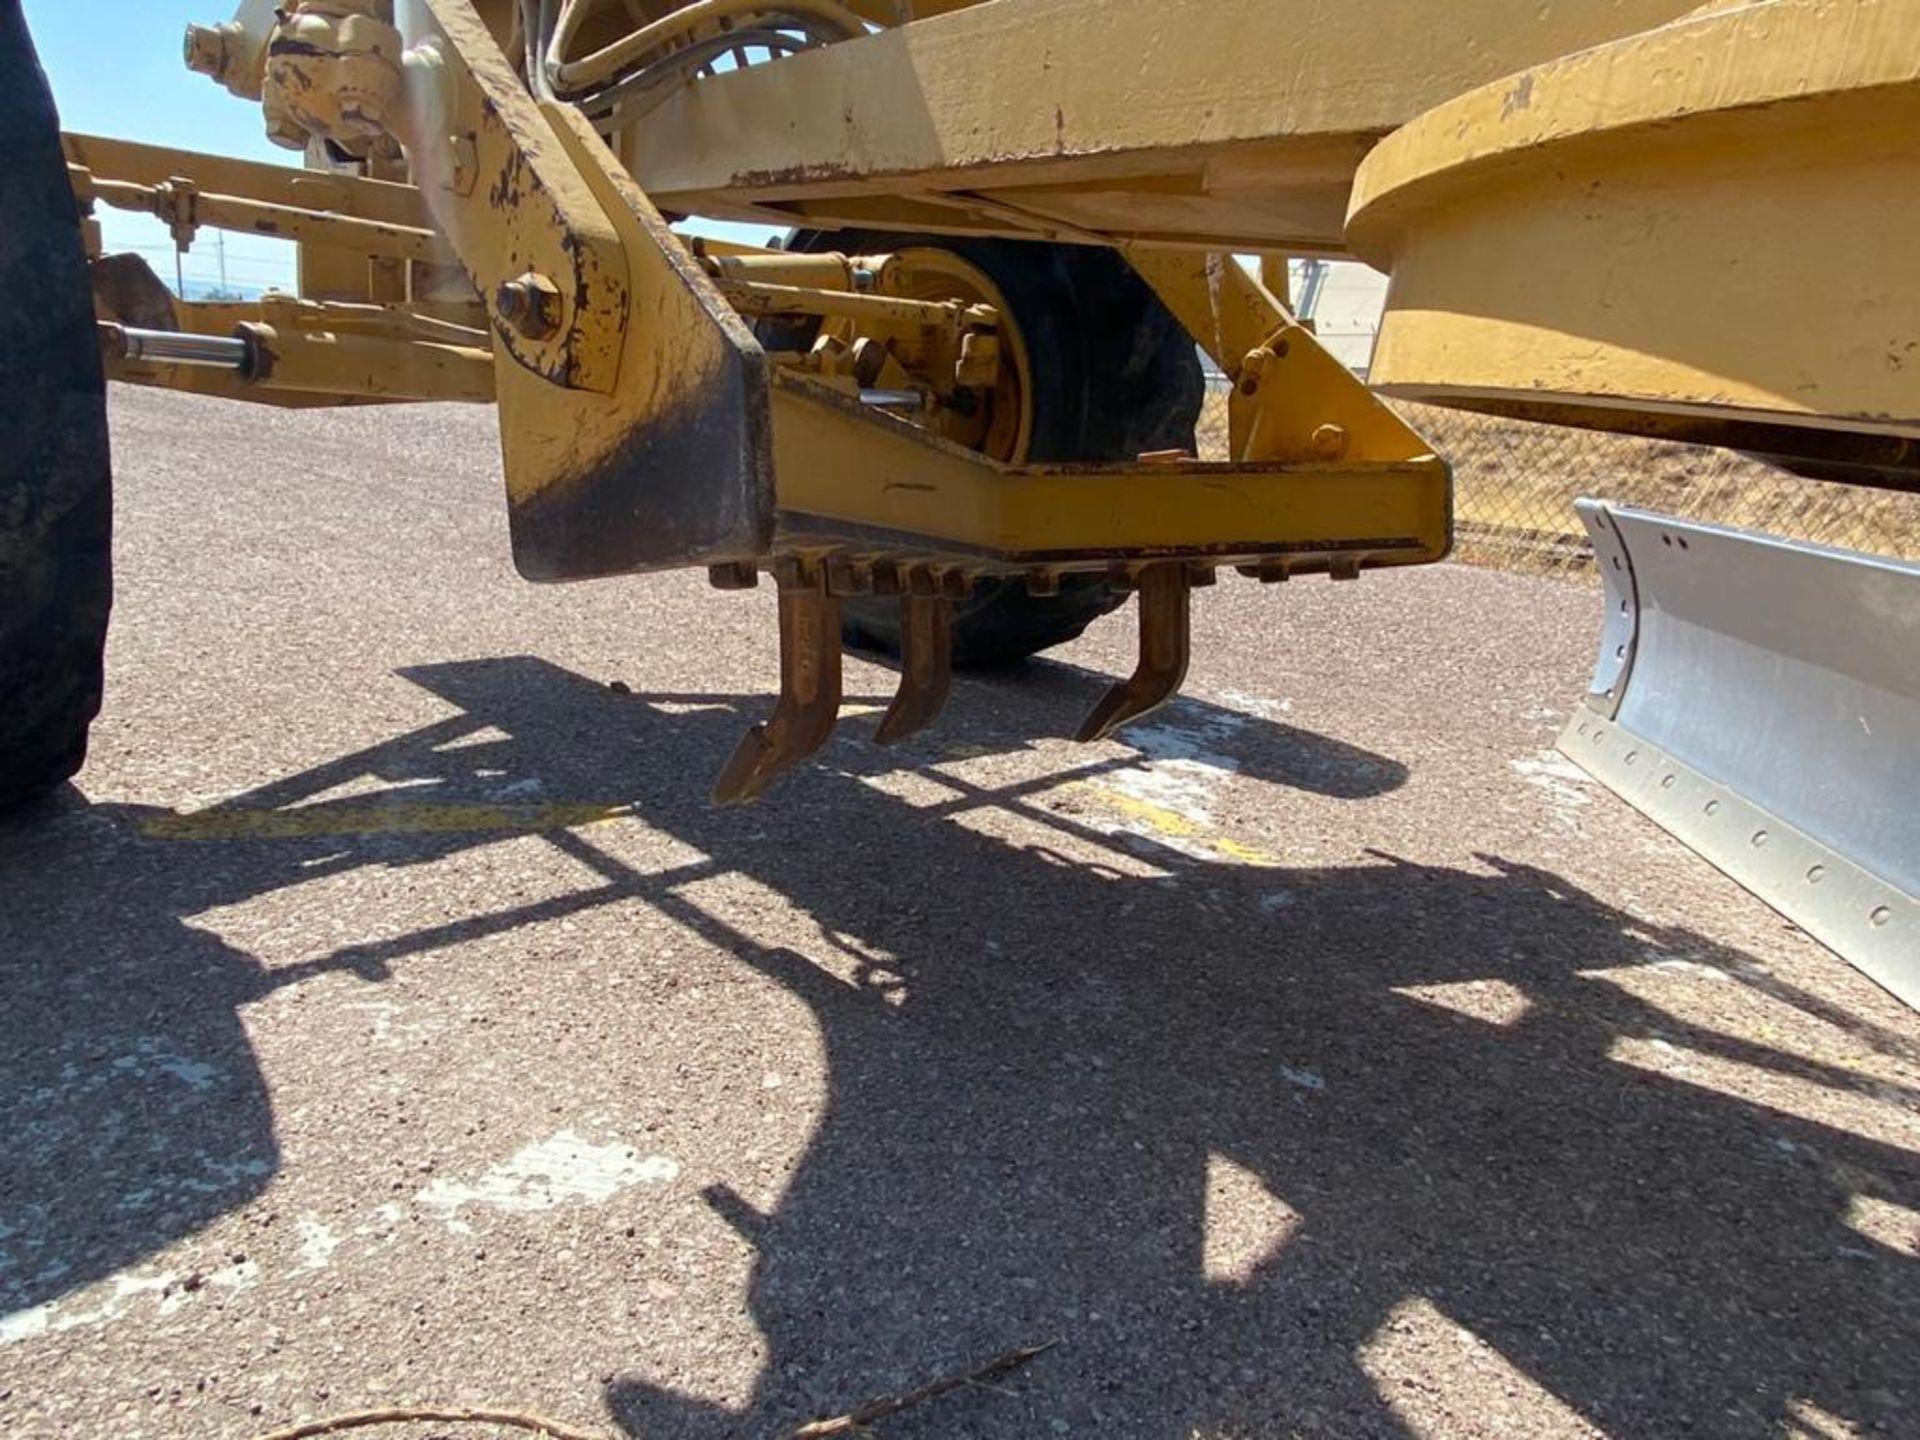 Caterpillar 120G Motor Grader, Serial number 87V09646, Motor number PQ883-2/07Z28983 - Image 26 of 61